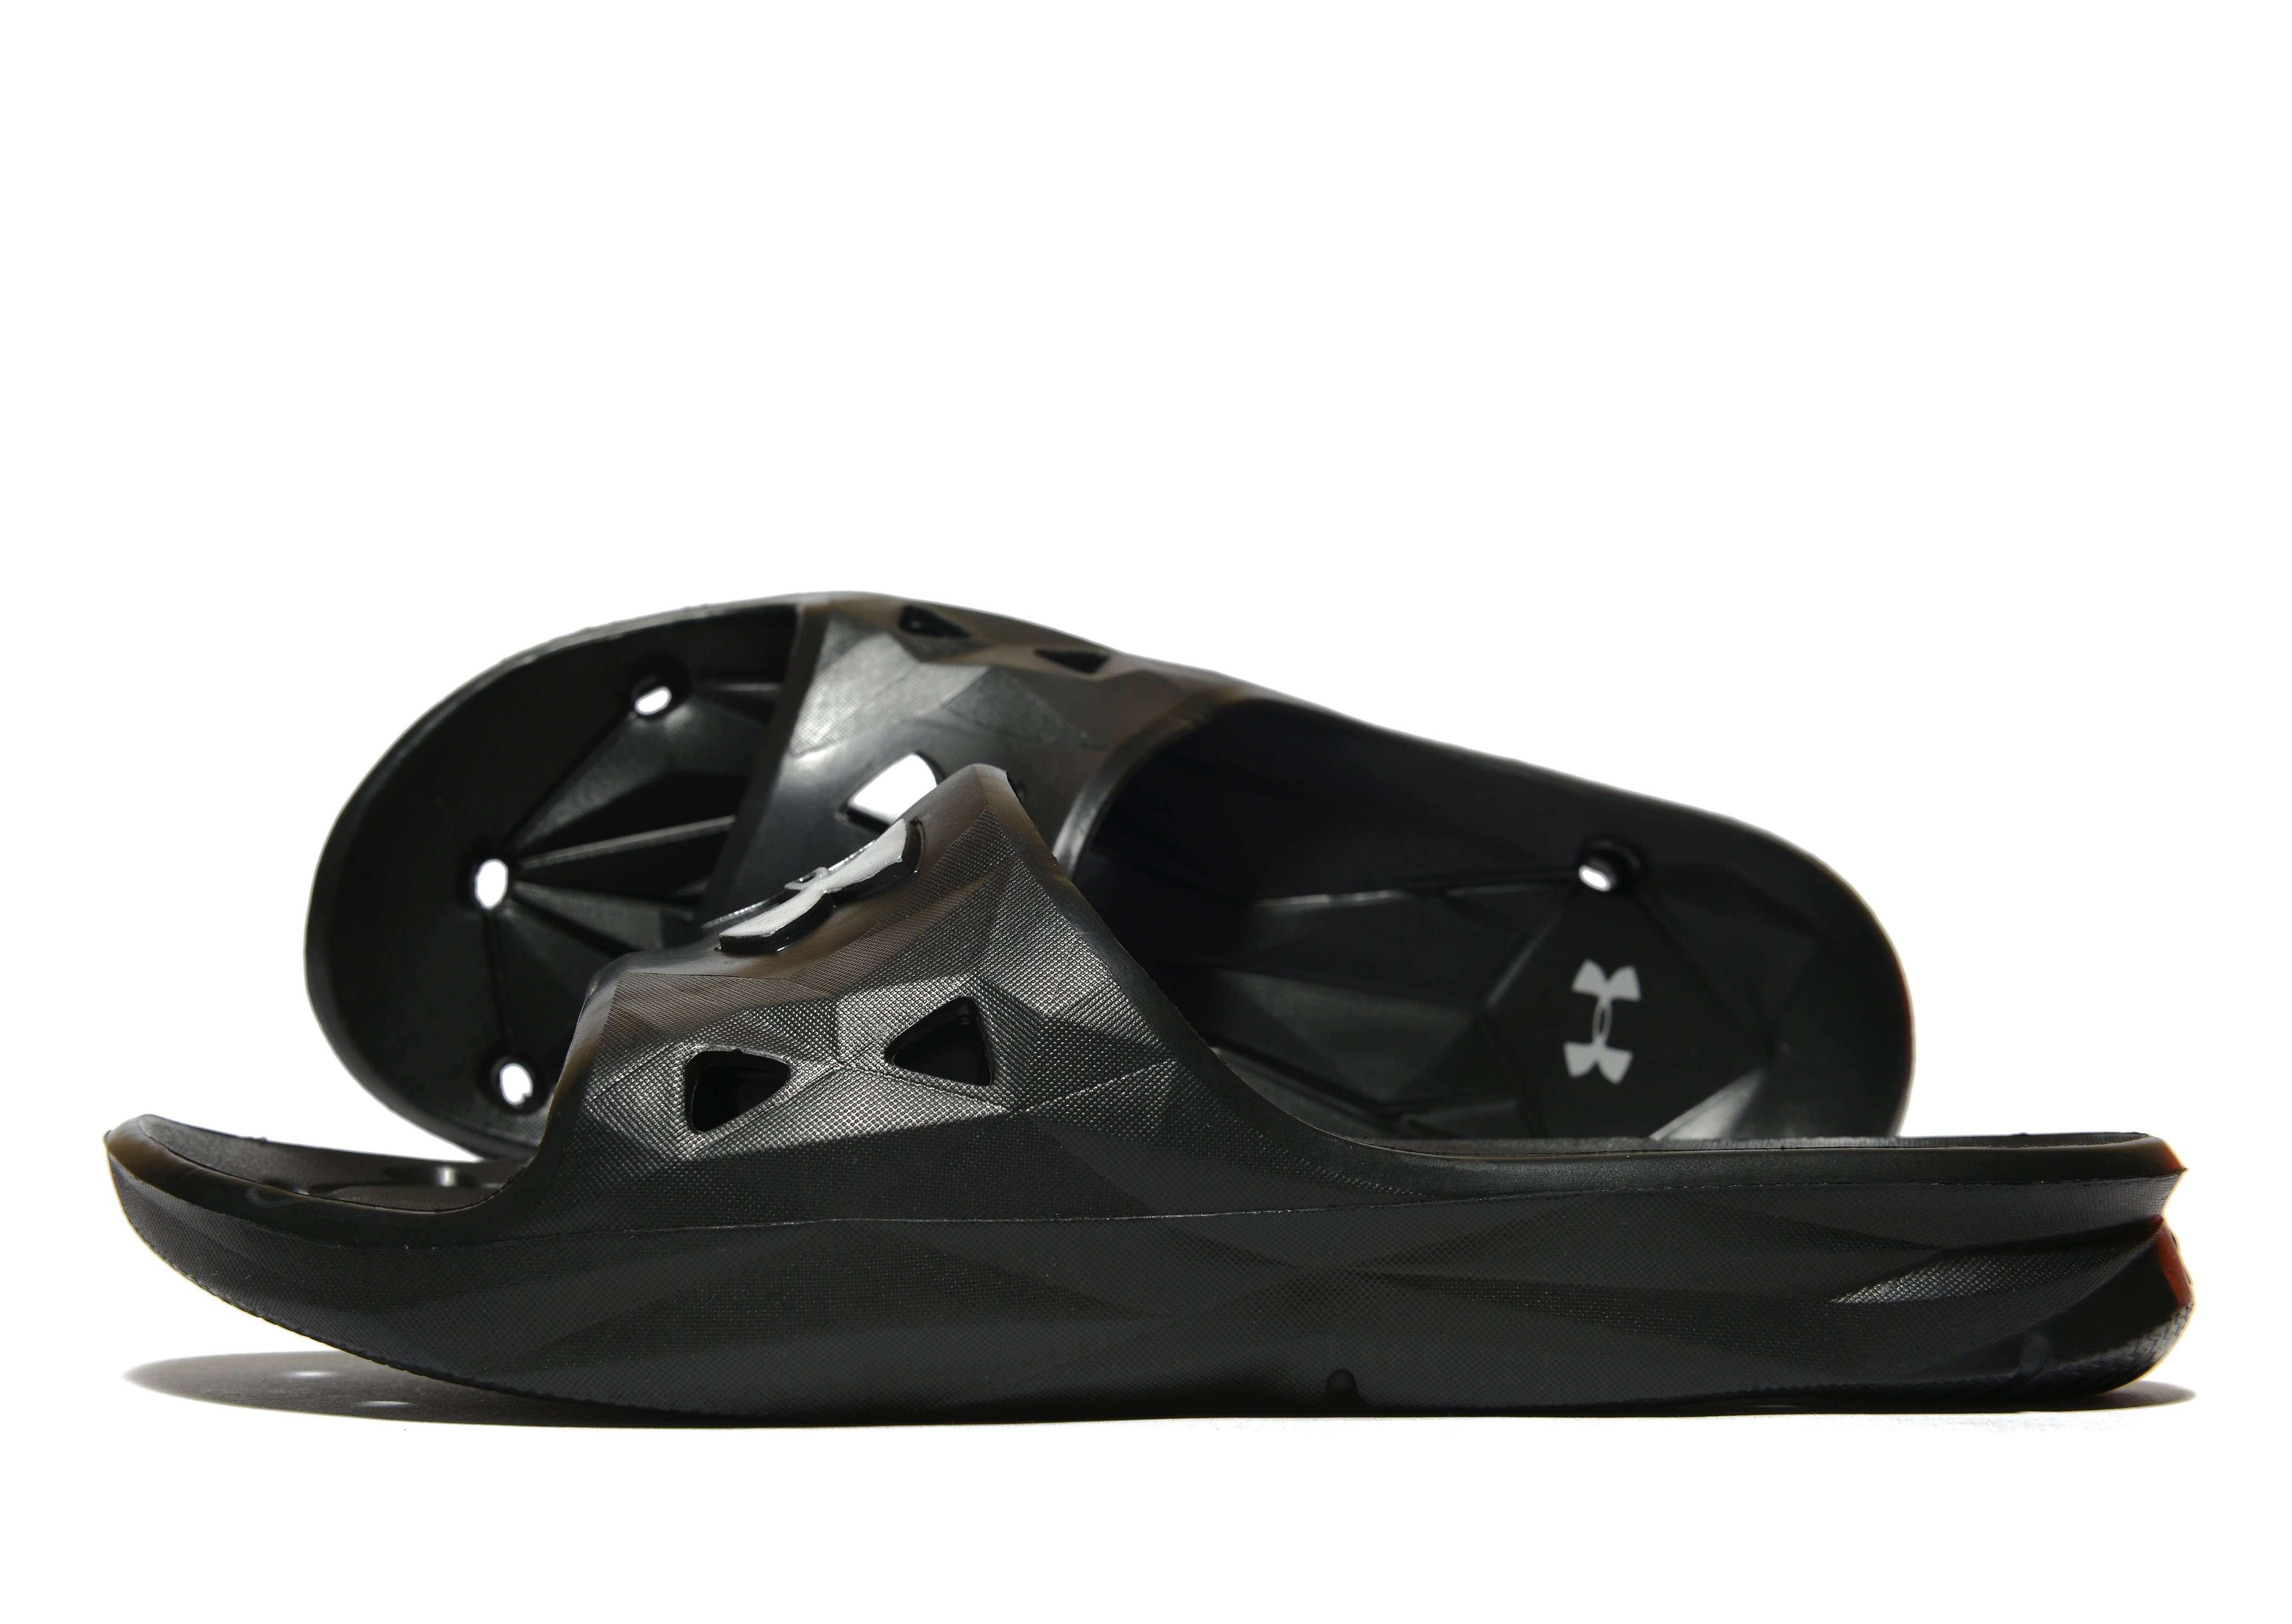 Under Armour Locker III Slides - Men's Flip Flops & Slides - Black 263113